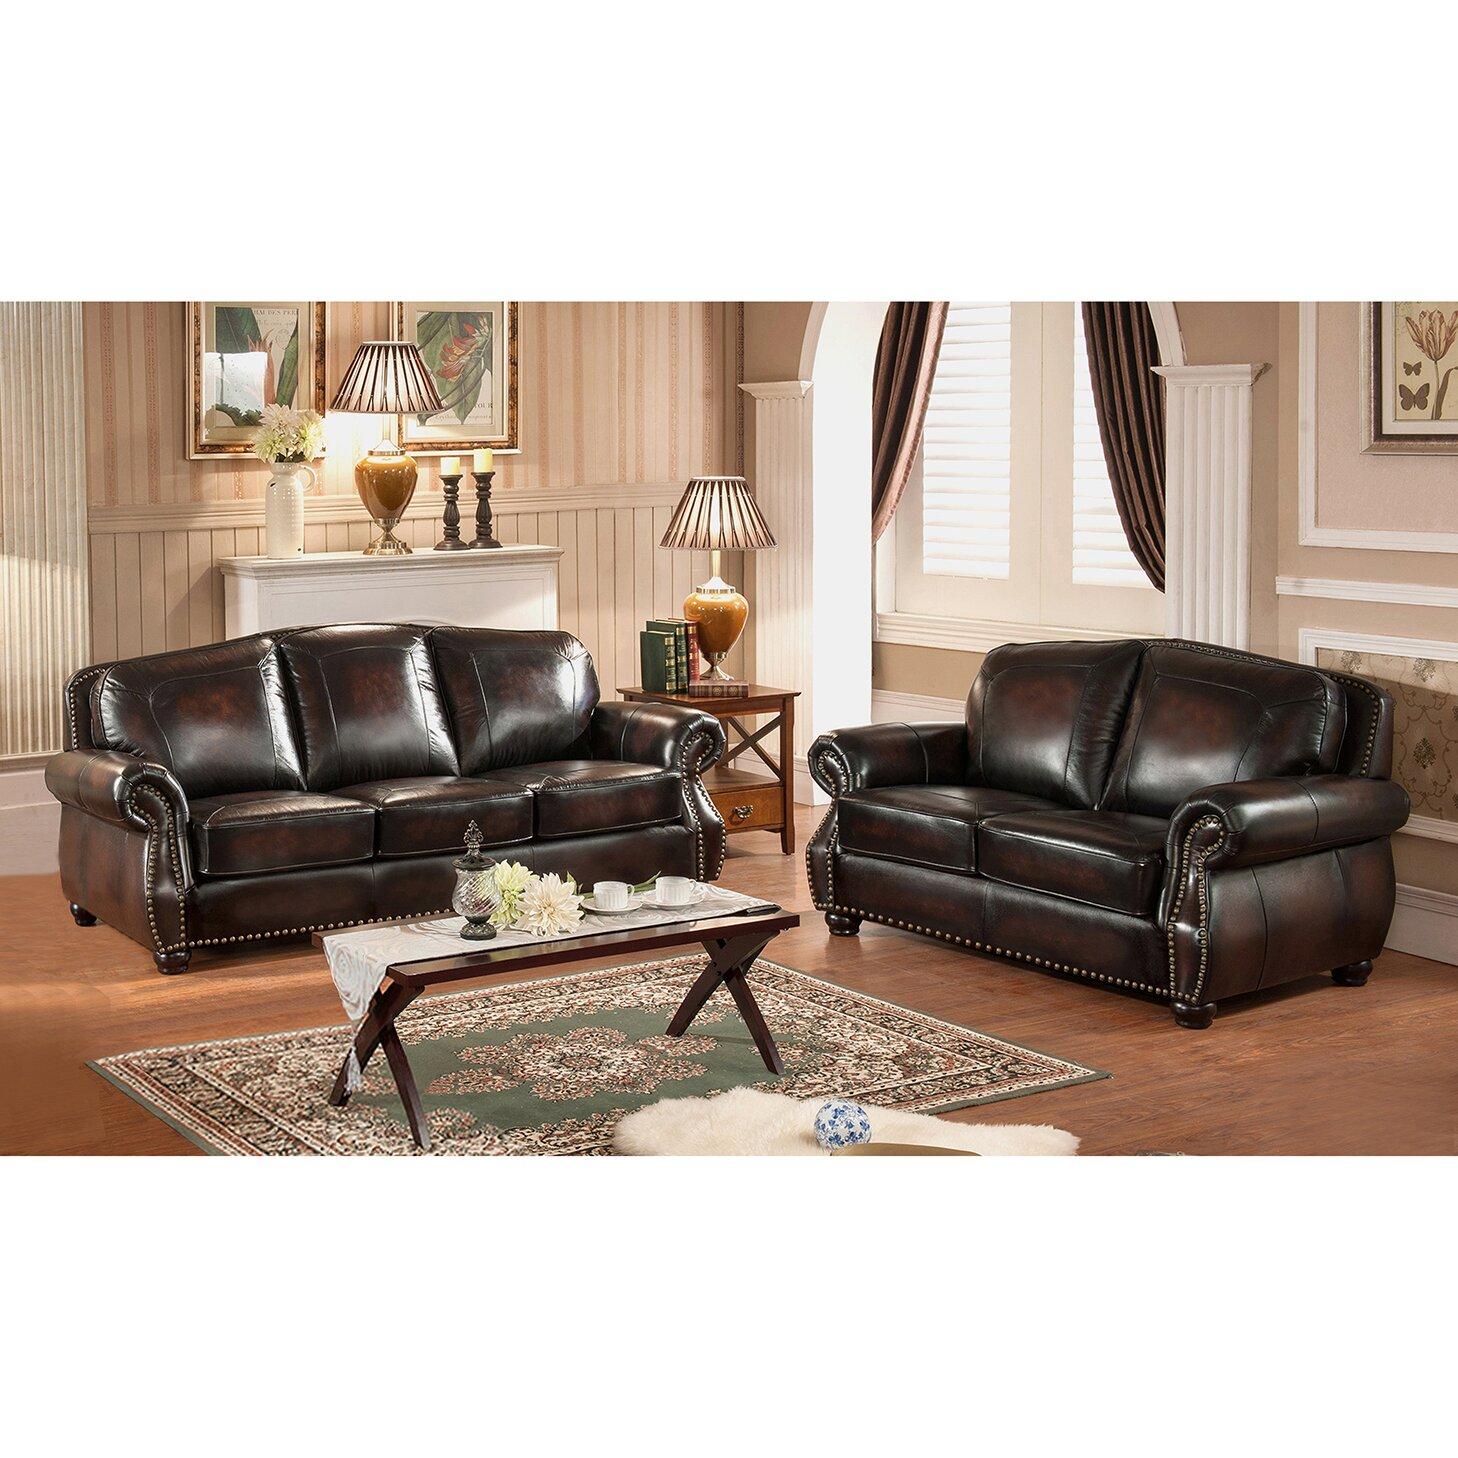 Vail Leather Sofa And Loveseat Set Wayfair